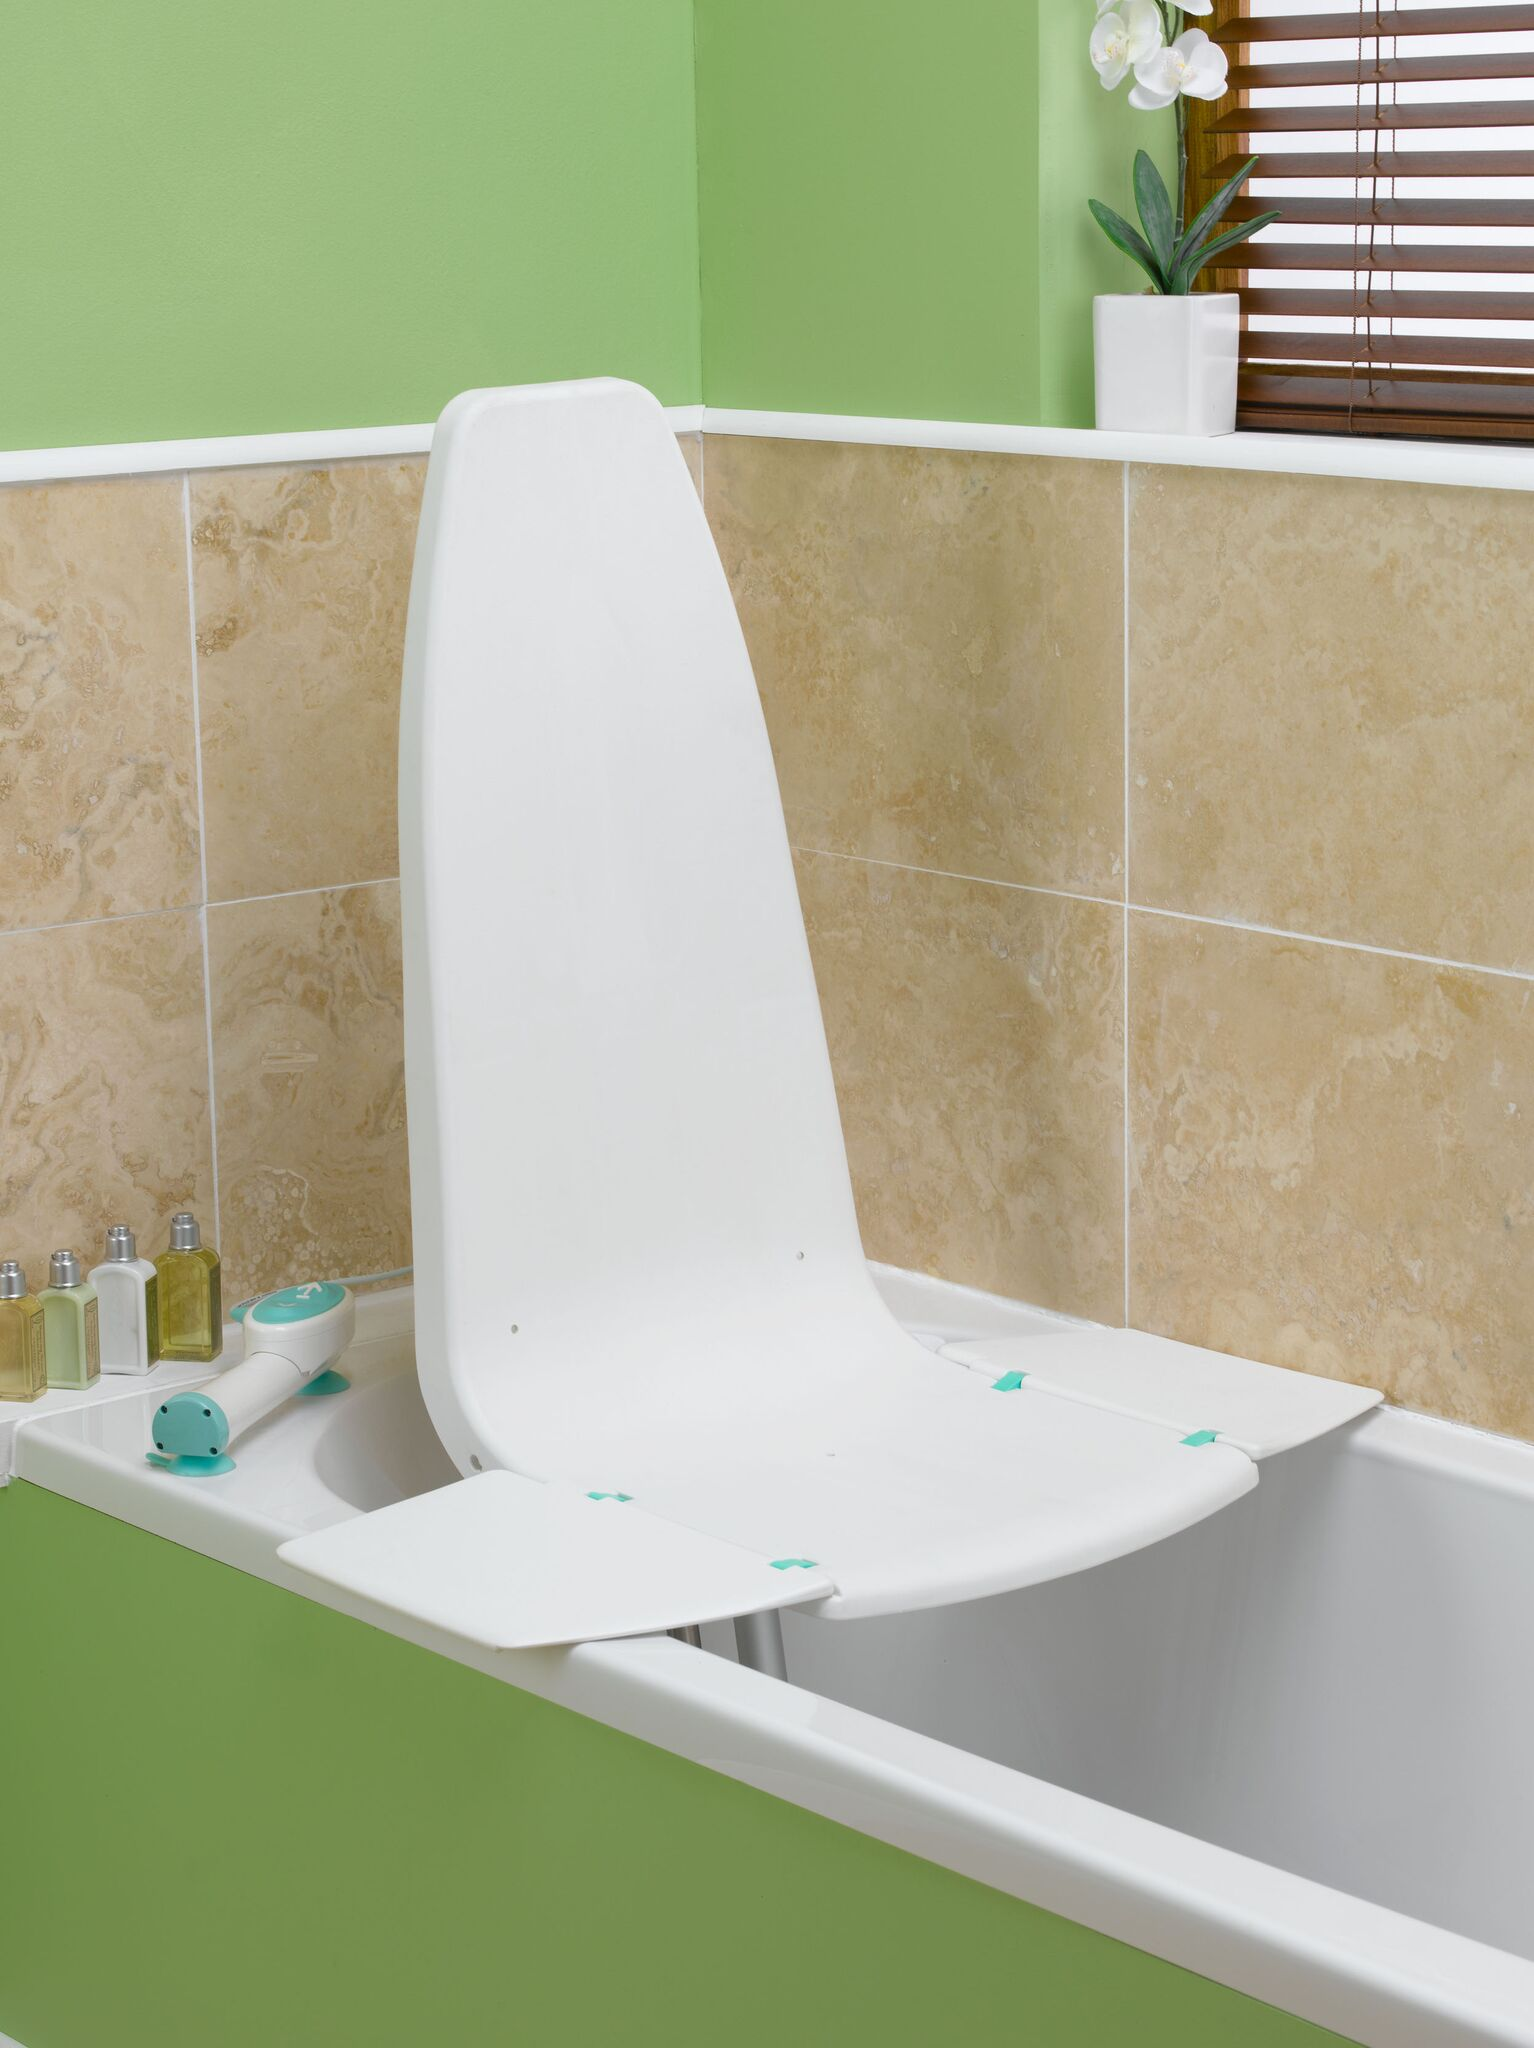 Neptune Bathlift – NEPA | Western Equipment Supplies